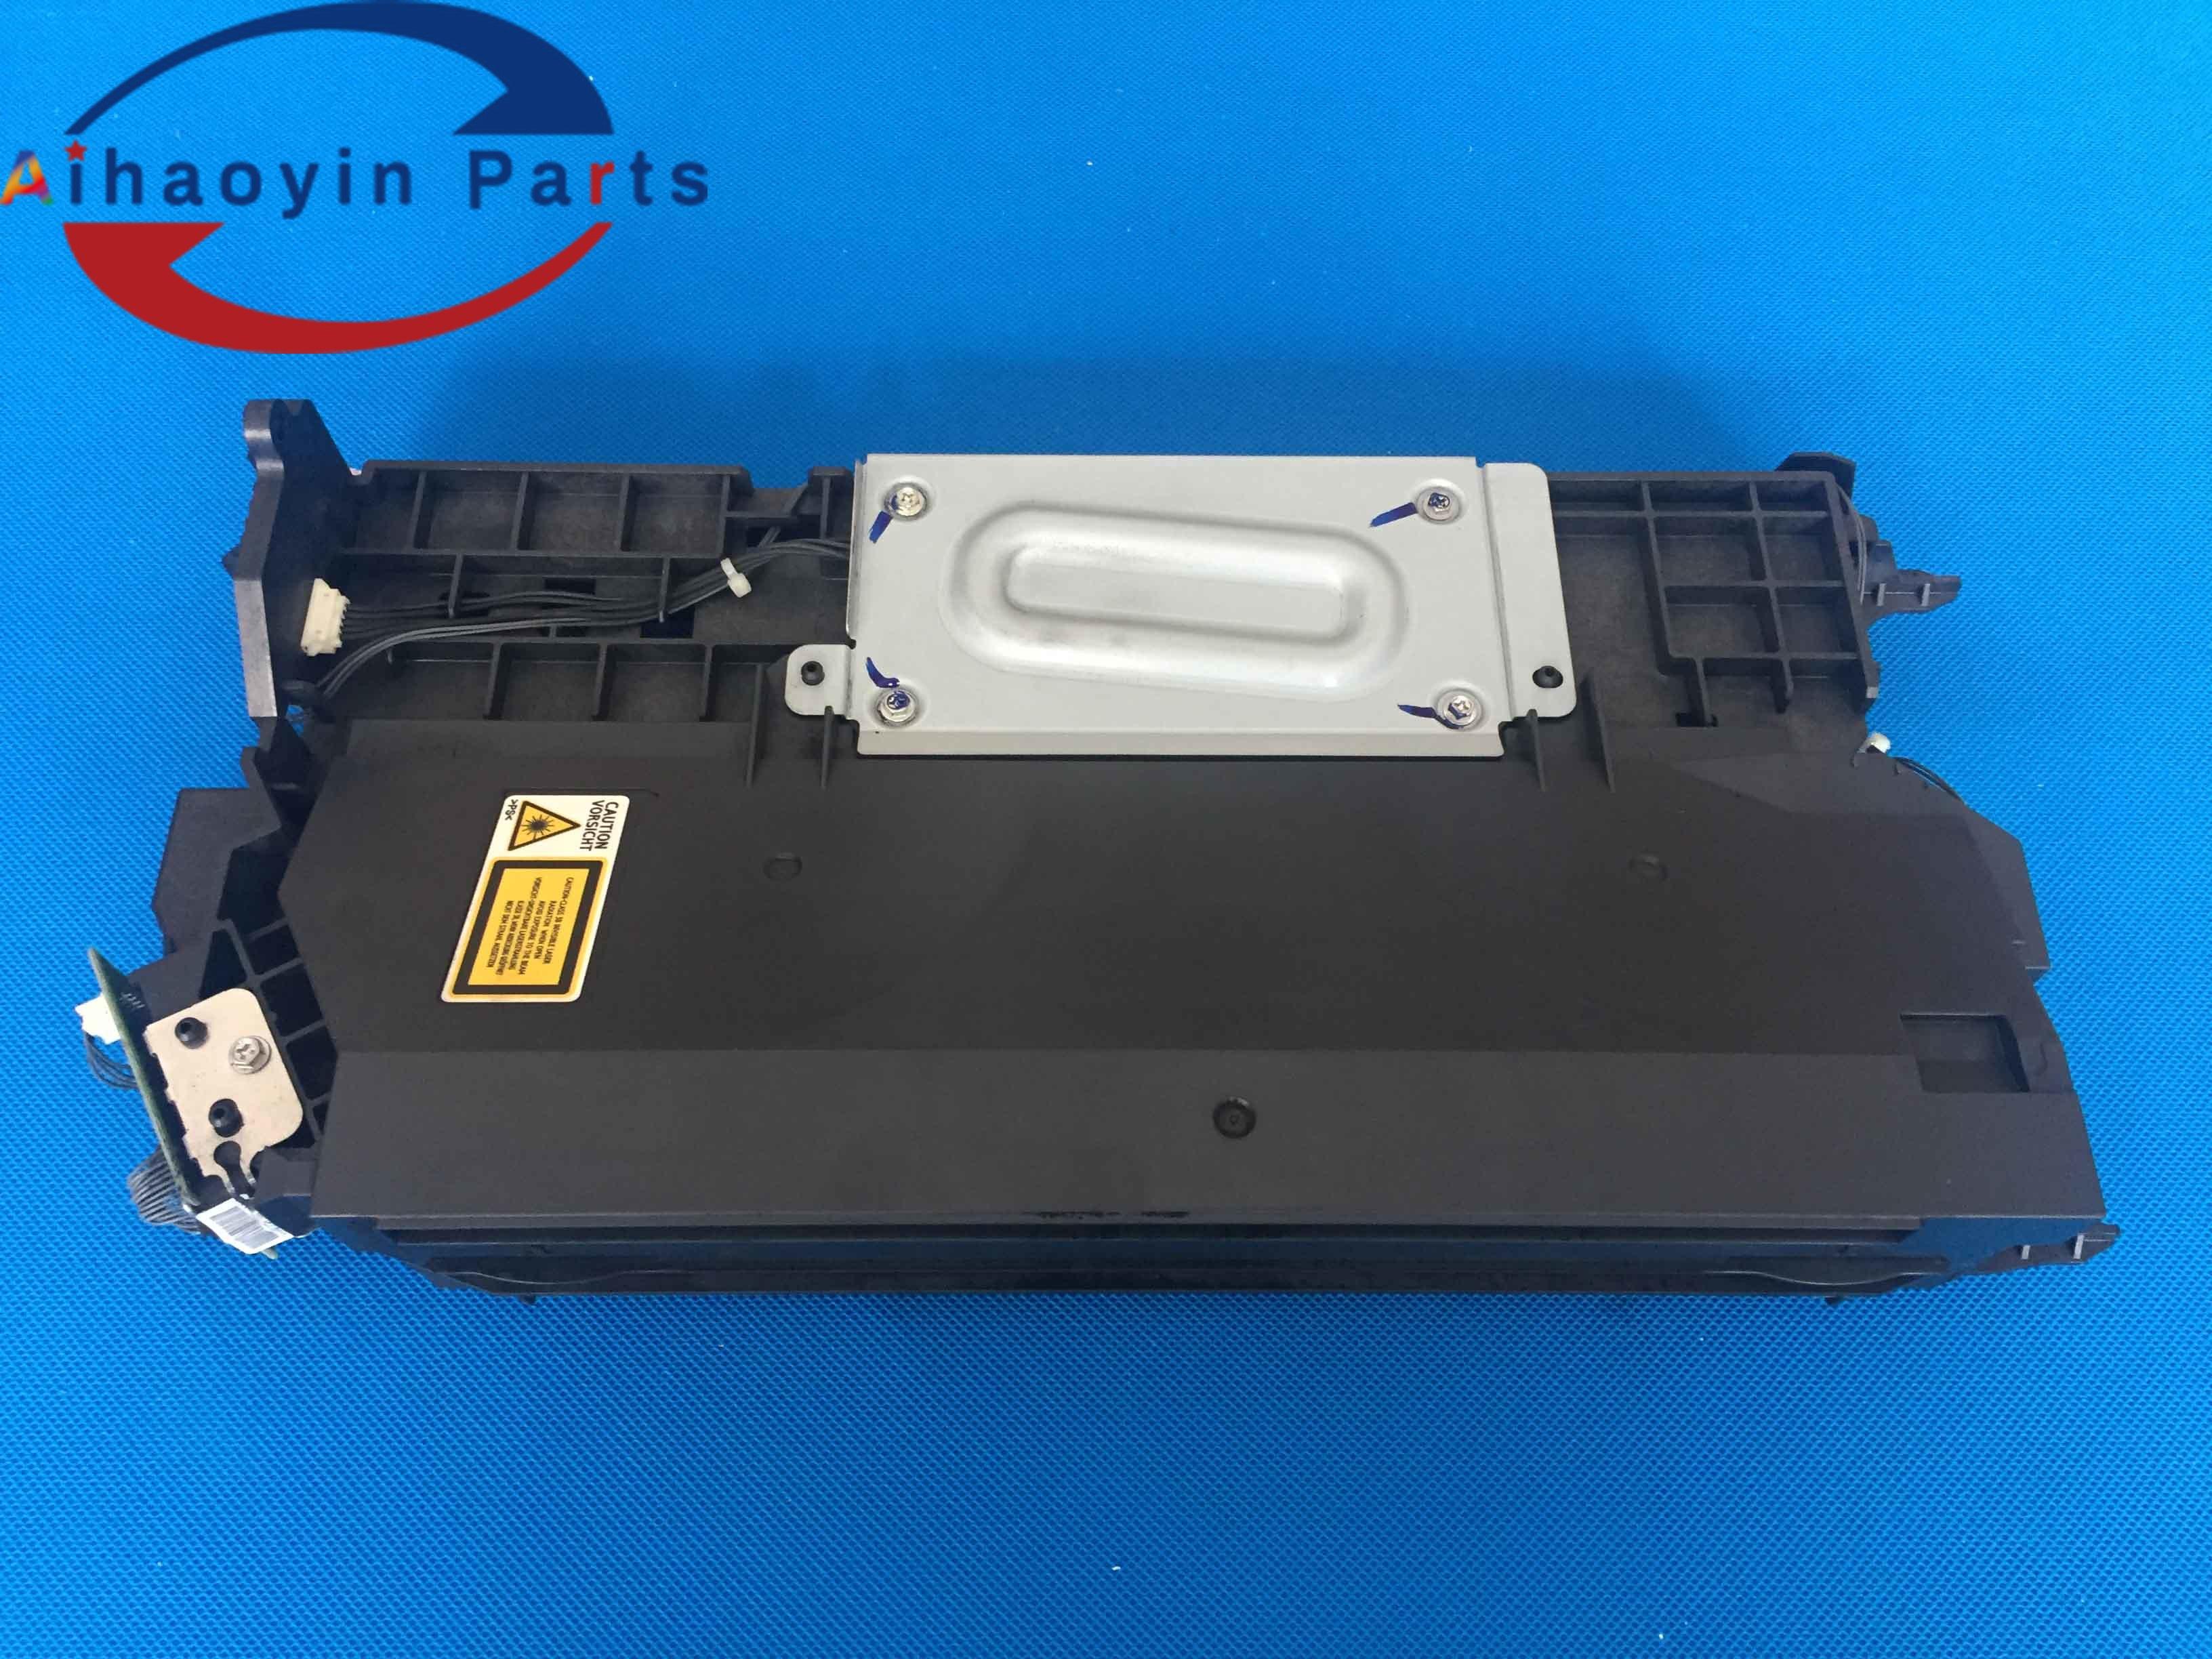 1 Uds refubis escáner láser para ricoh MP4000 4002, 4001, 5001, 5002, 5000 4000B 5000b